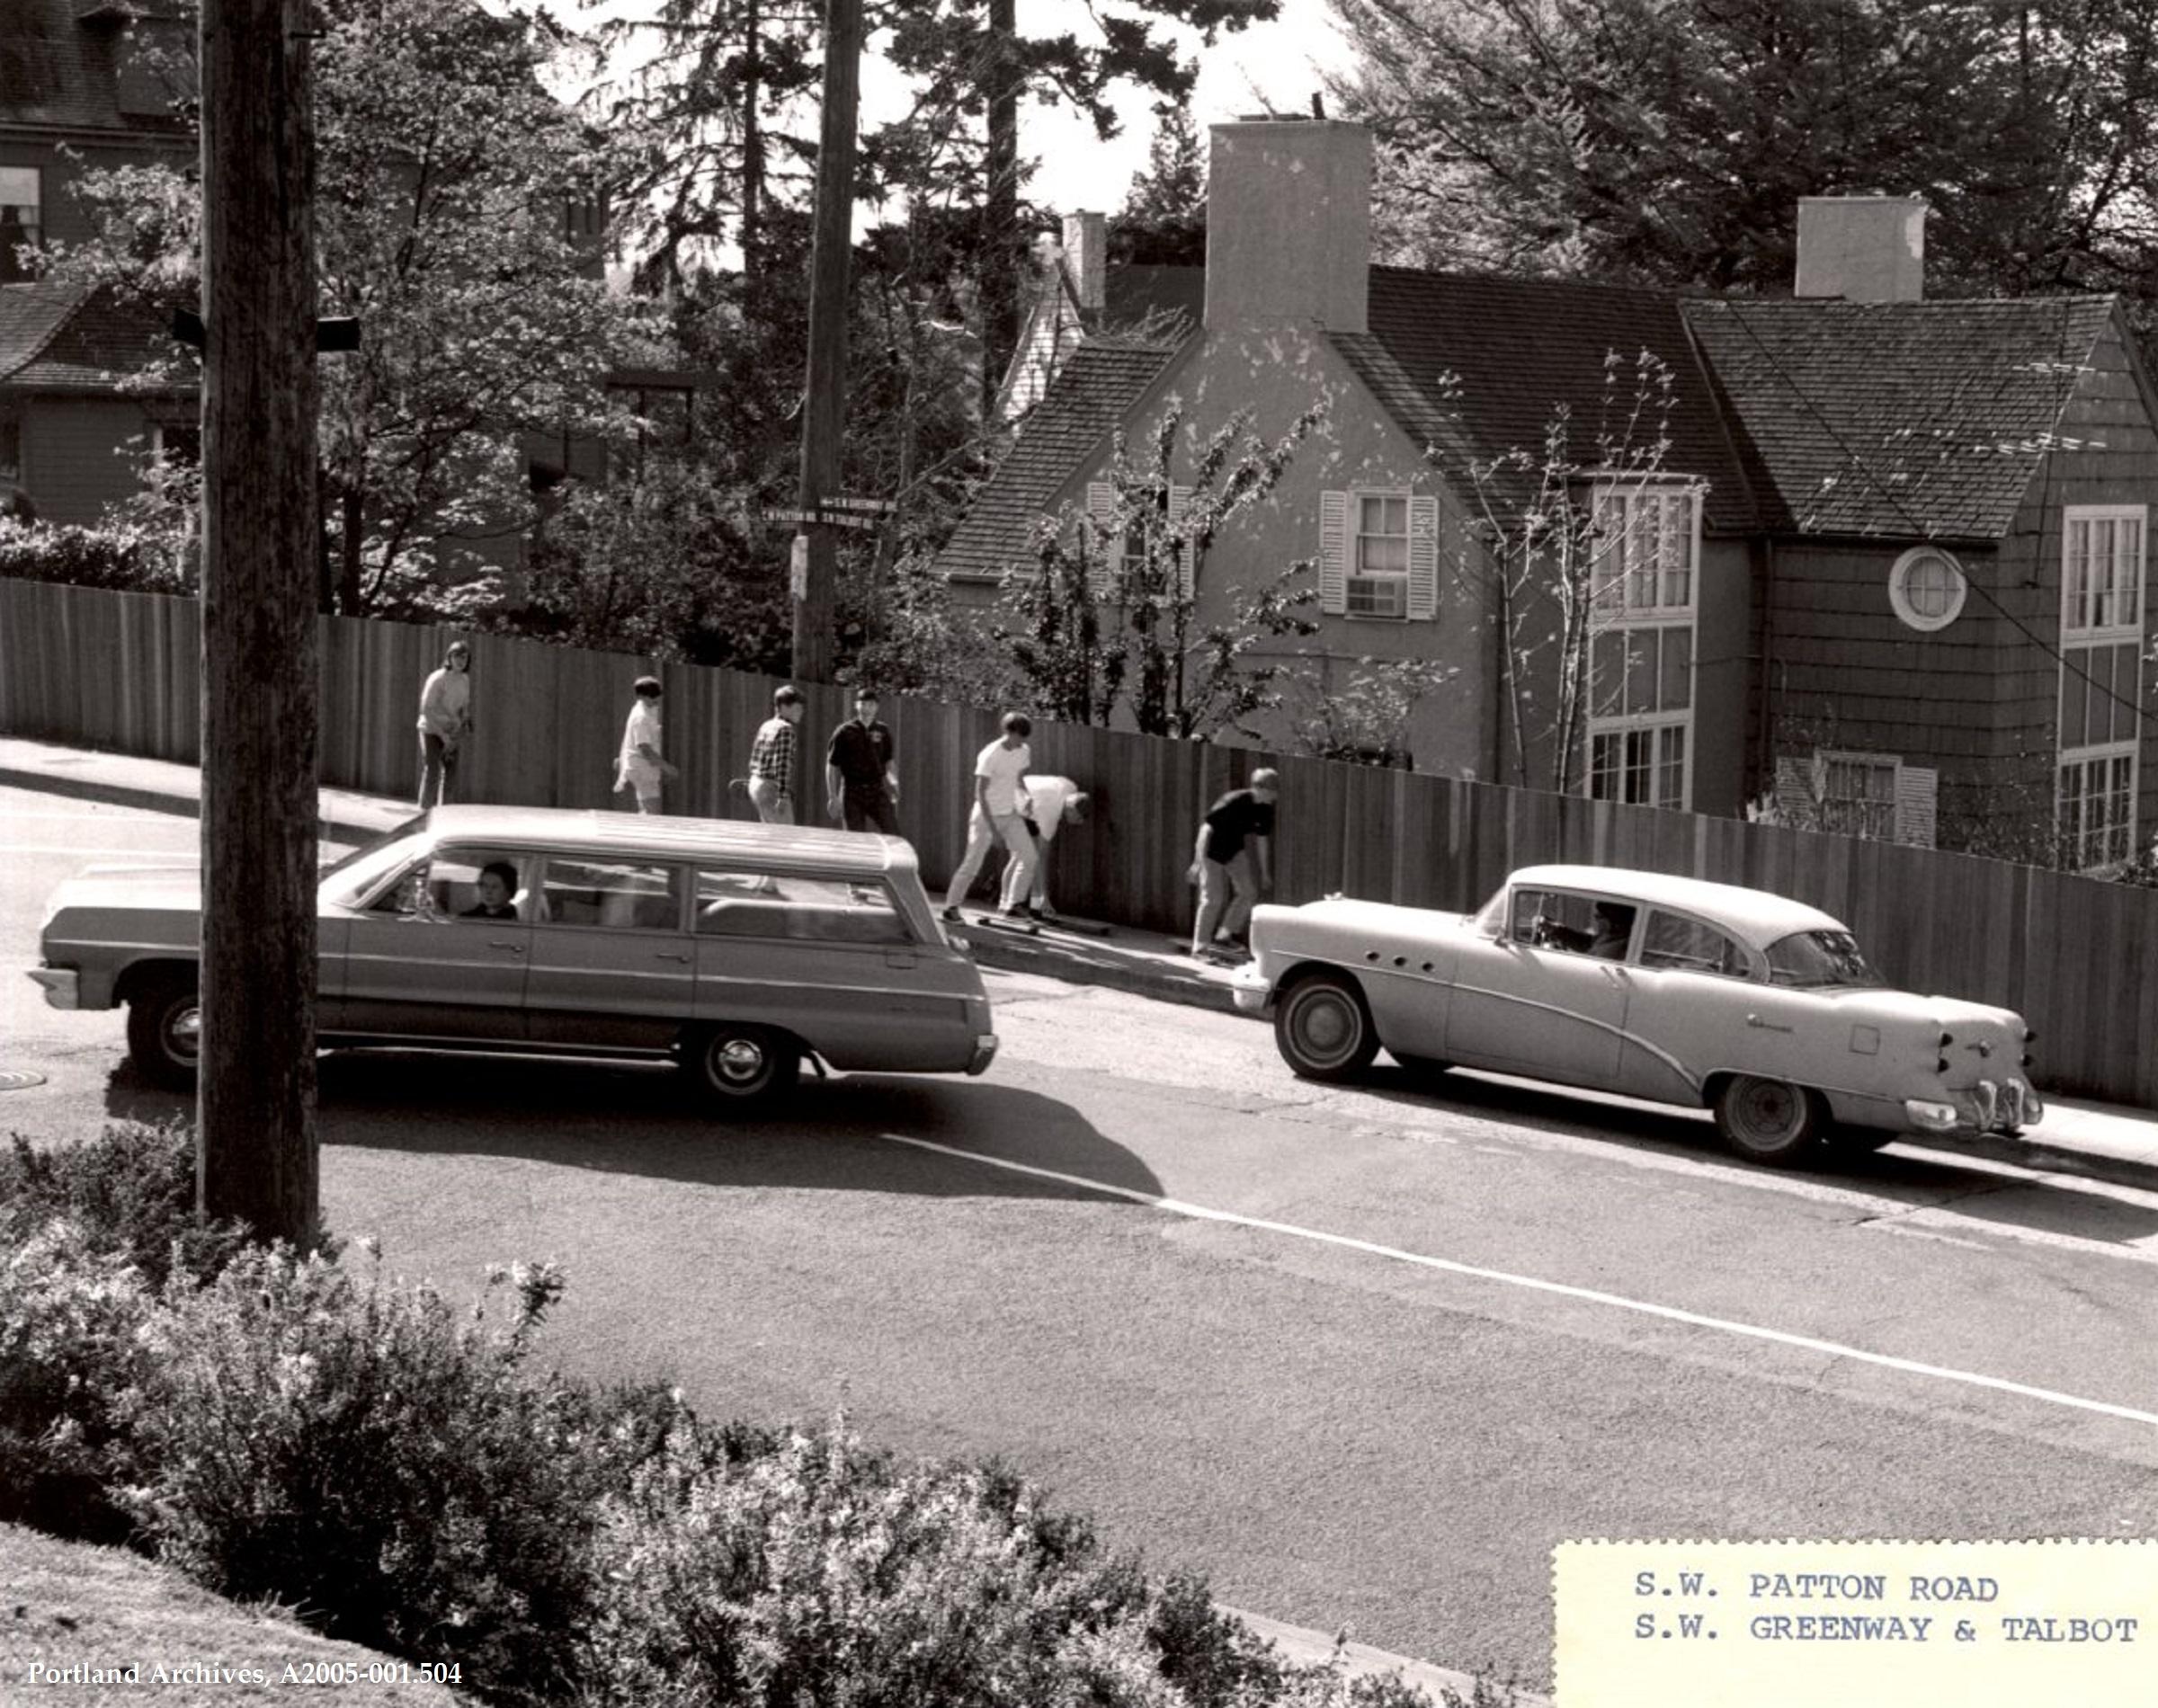 City of Portland Archives, Oregon, A2005-001.504